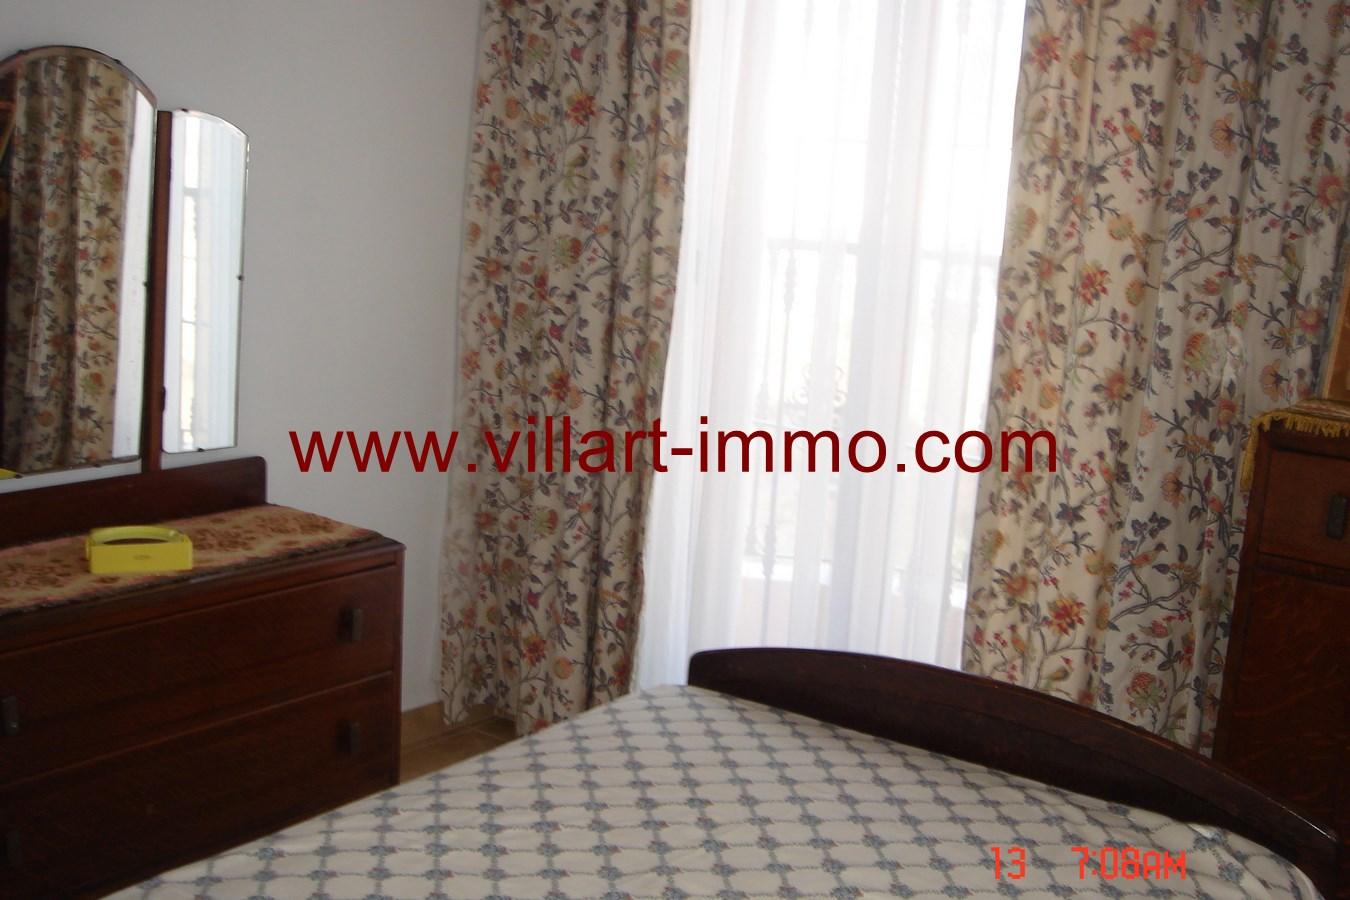 4-a-vendre-villa-tanger-hijriyin-chambre-vv430-villart-immo